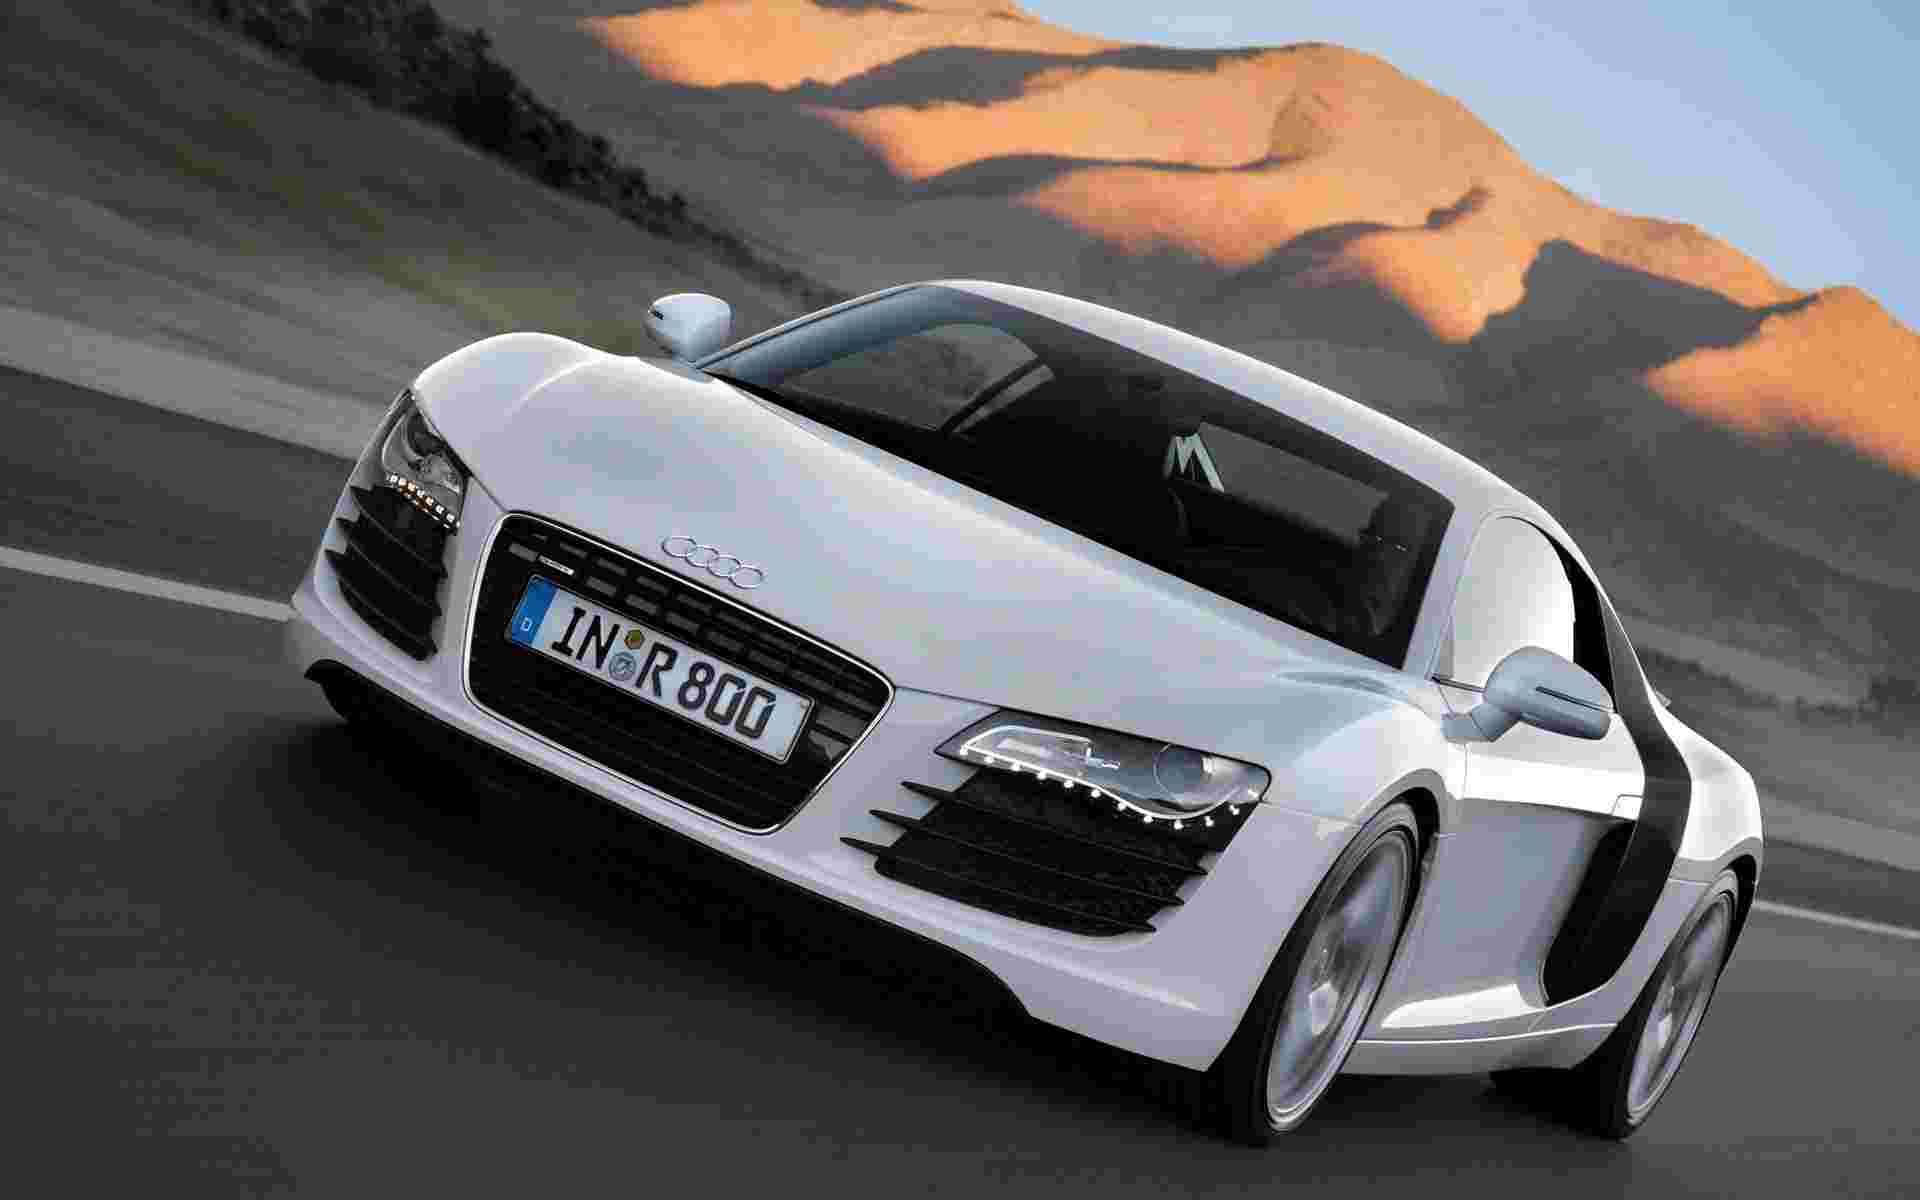 Audi R8 widescreen 0524538 wallpaper   Audi   Auto Moto   Wallpaper 1920x1200